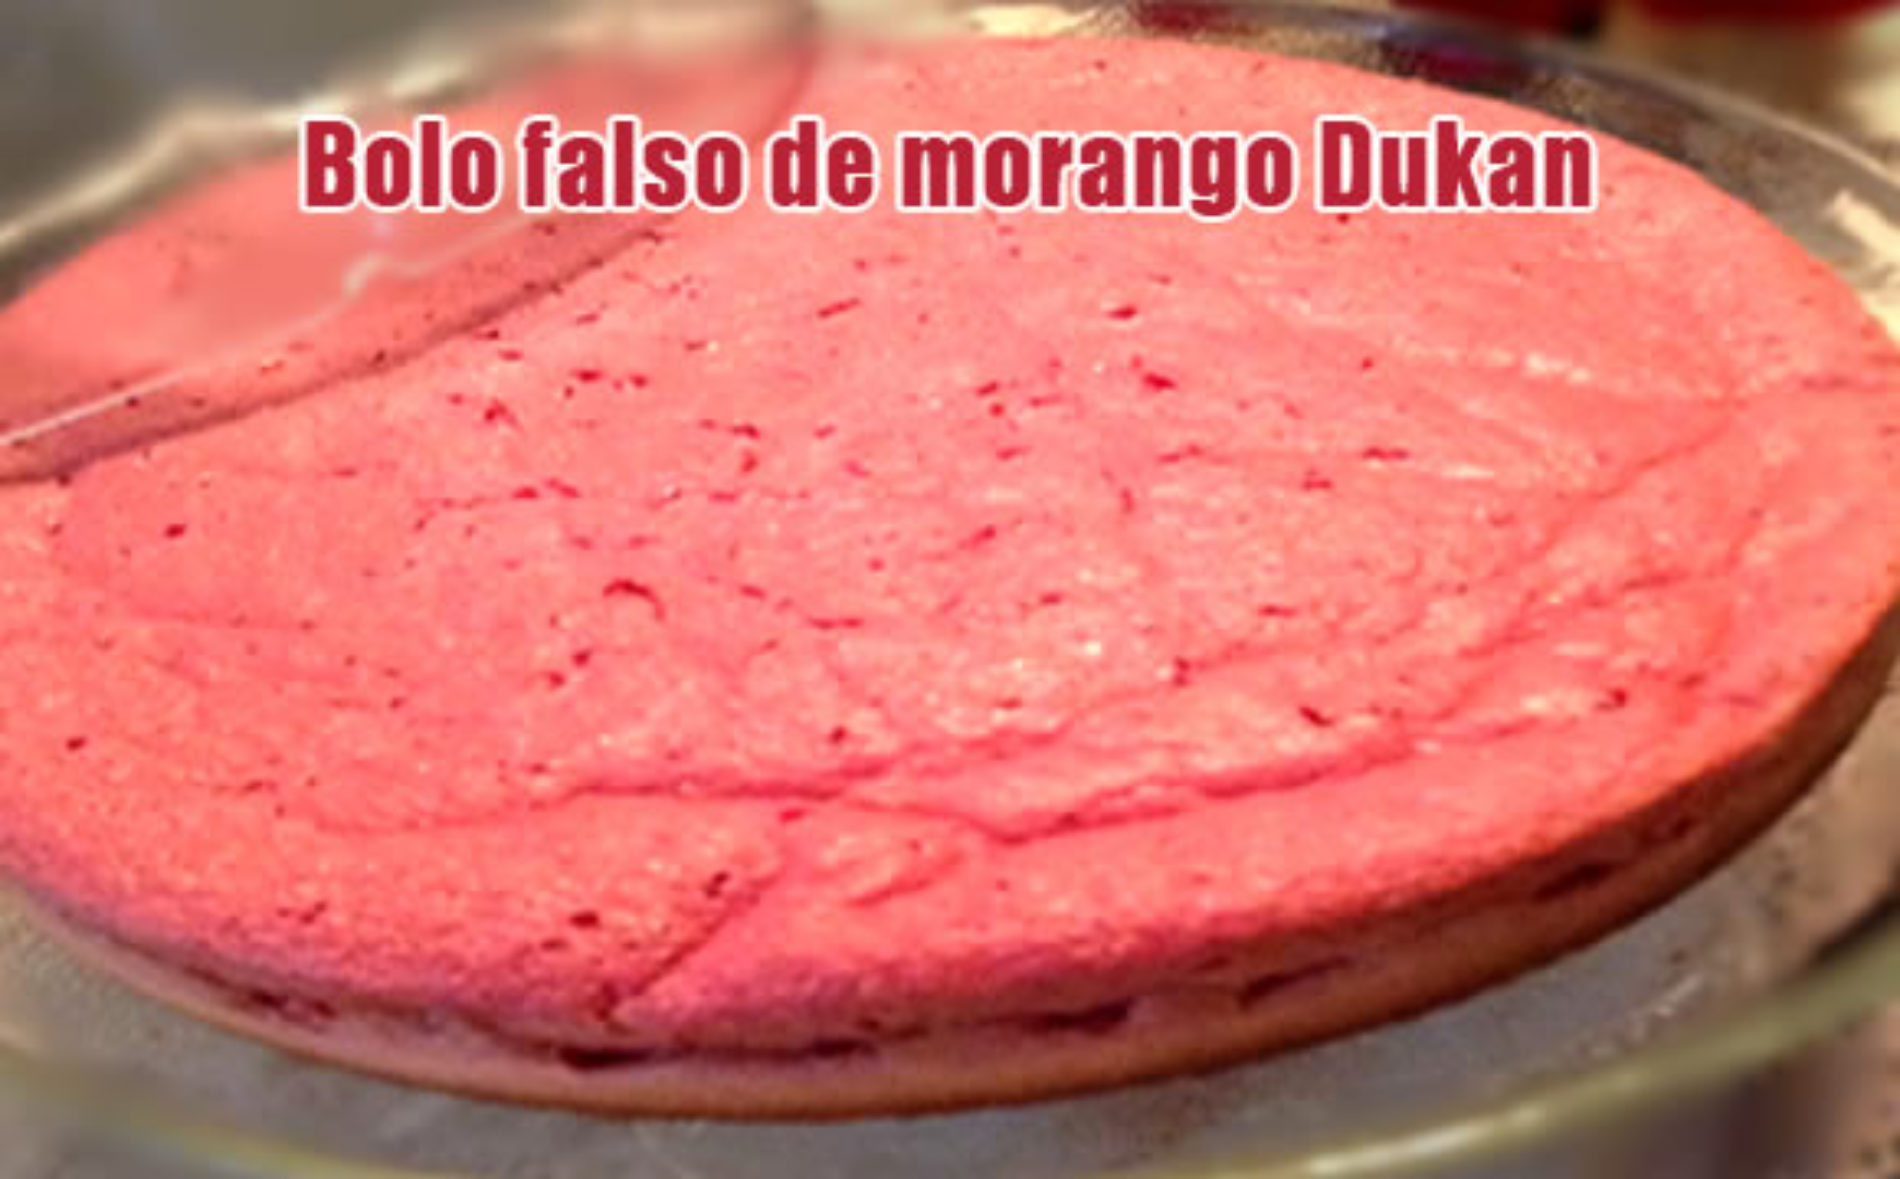 Bolo falso dukan de morango com farelo de aveia